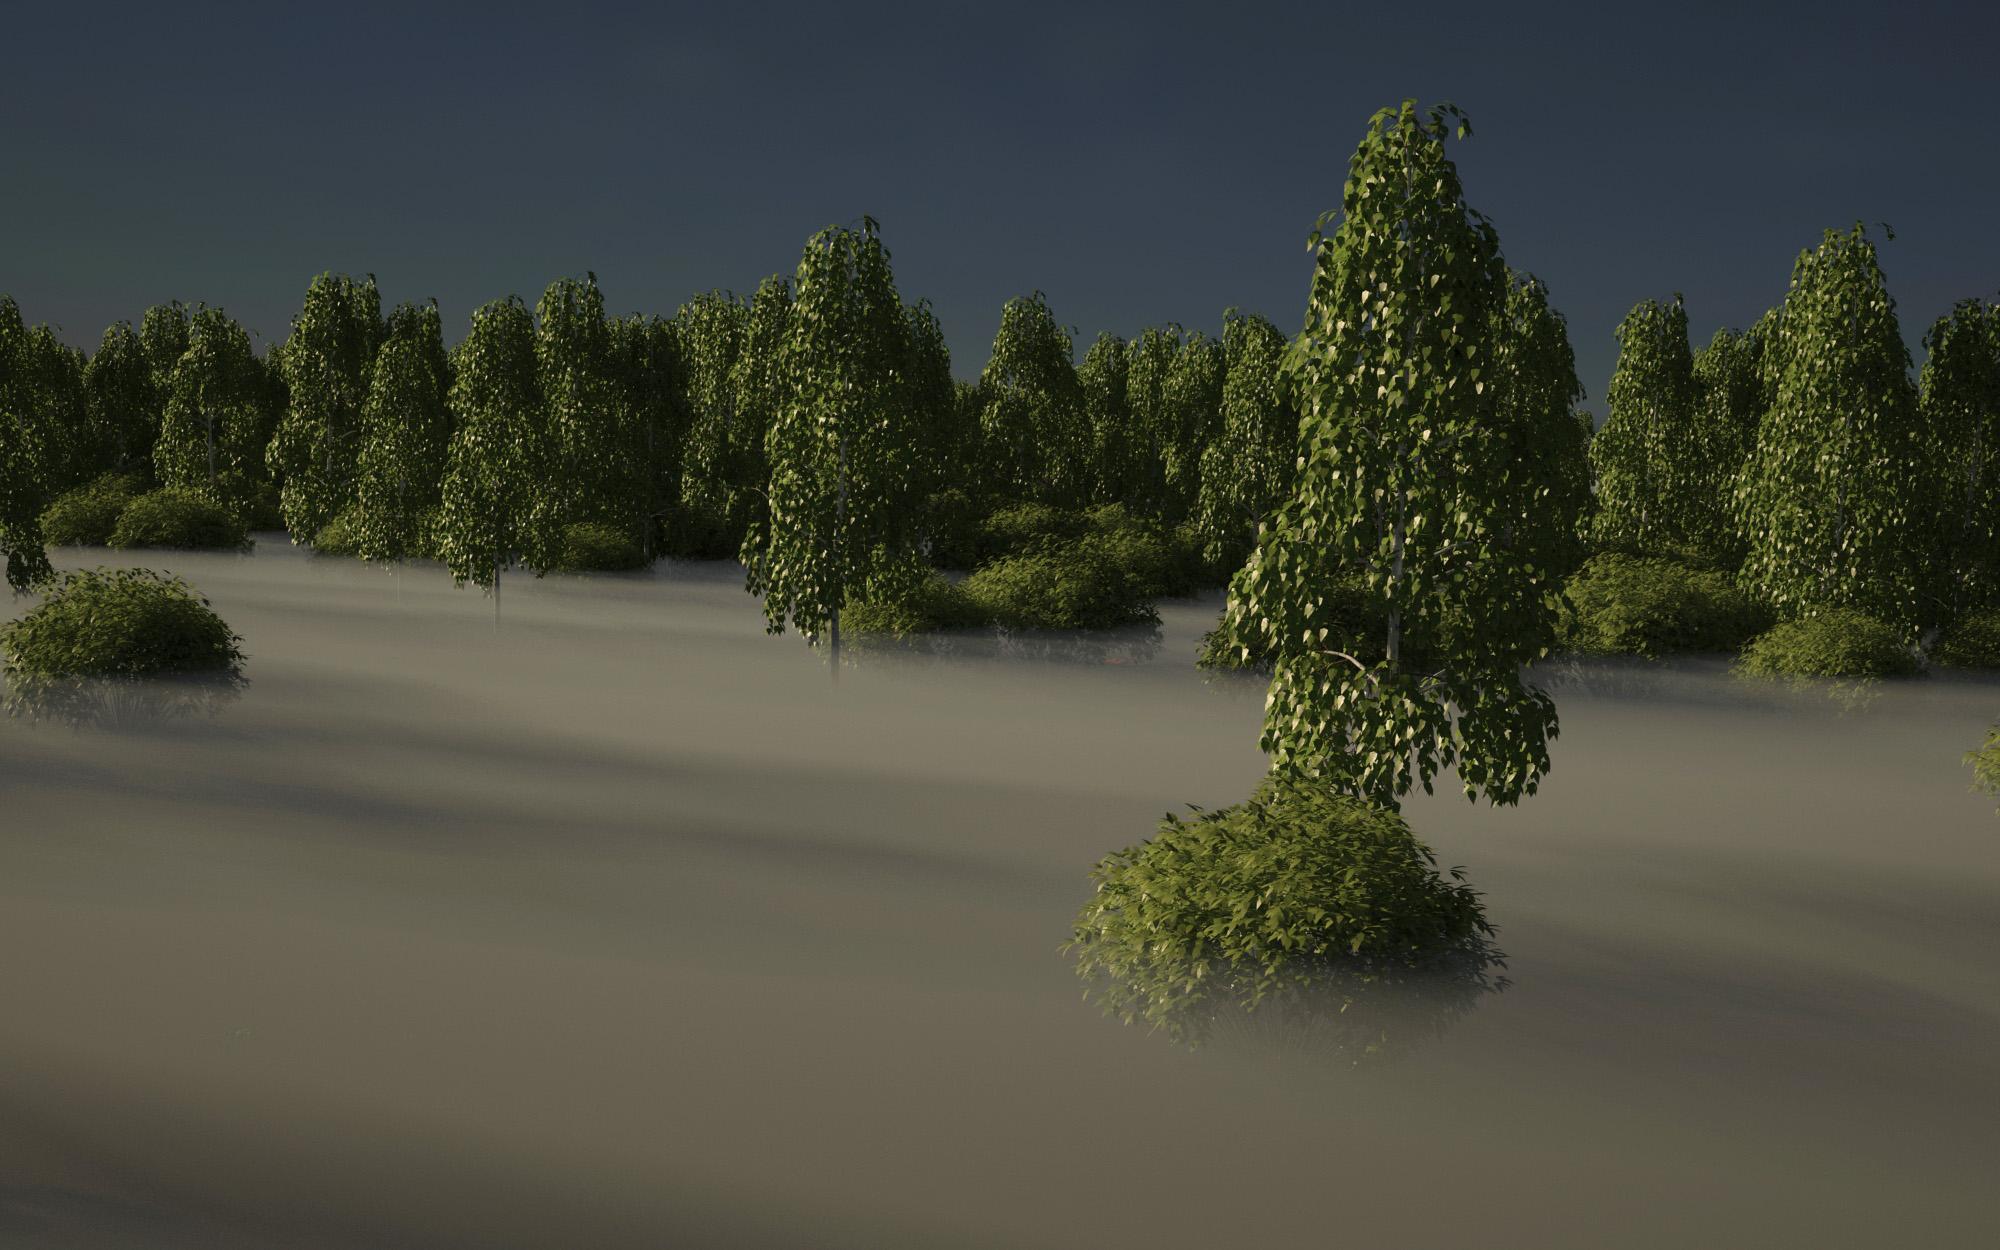 forest-test_VRayCam001_05-18-2017